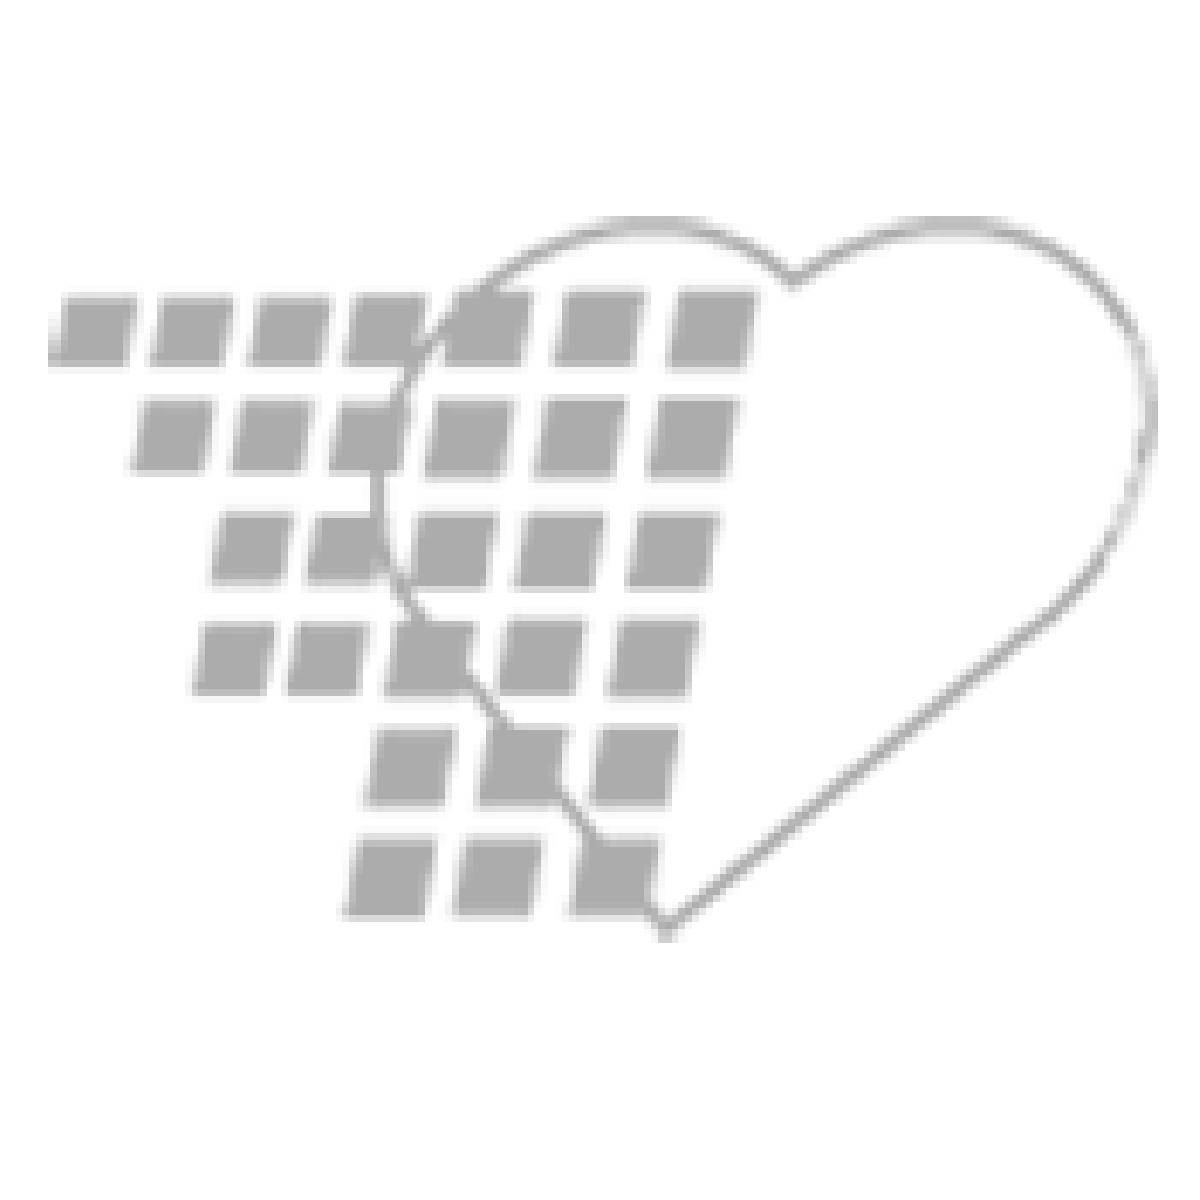 "06-26-1434 - BD   Insyte Autoguard IV Cath Wingless - 20G x 1.16"""